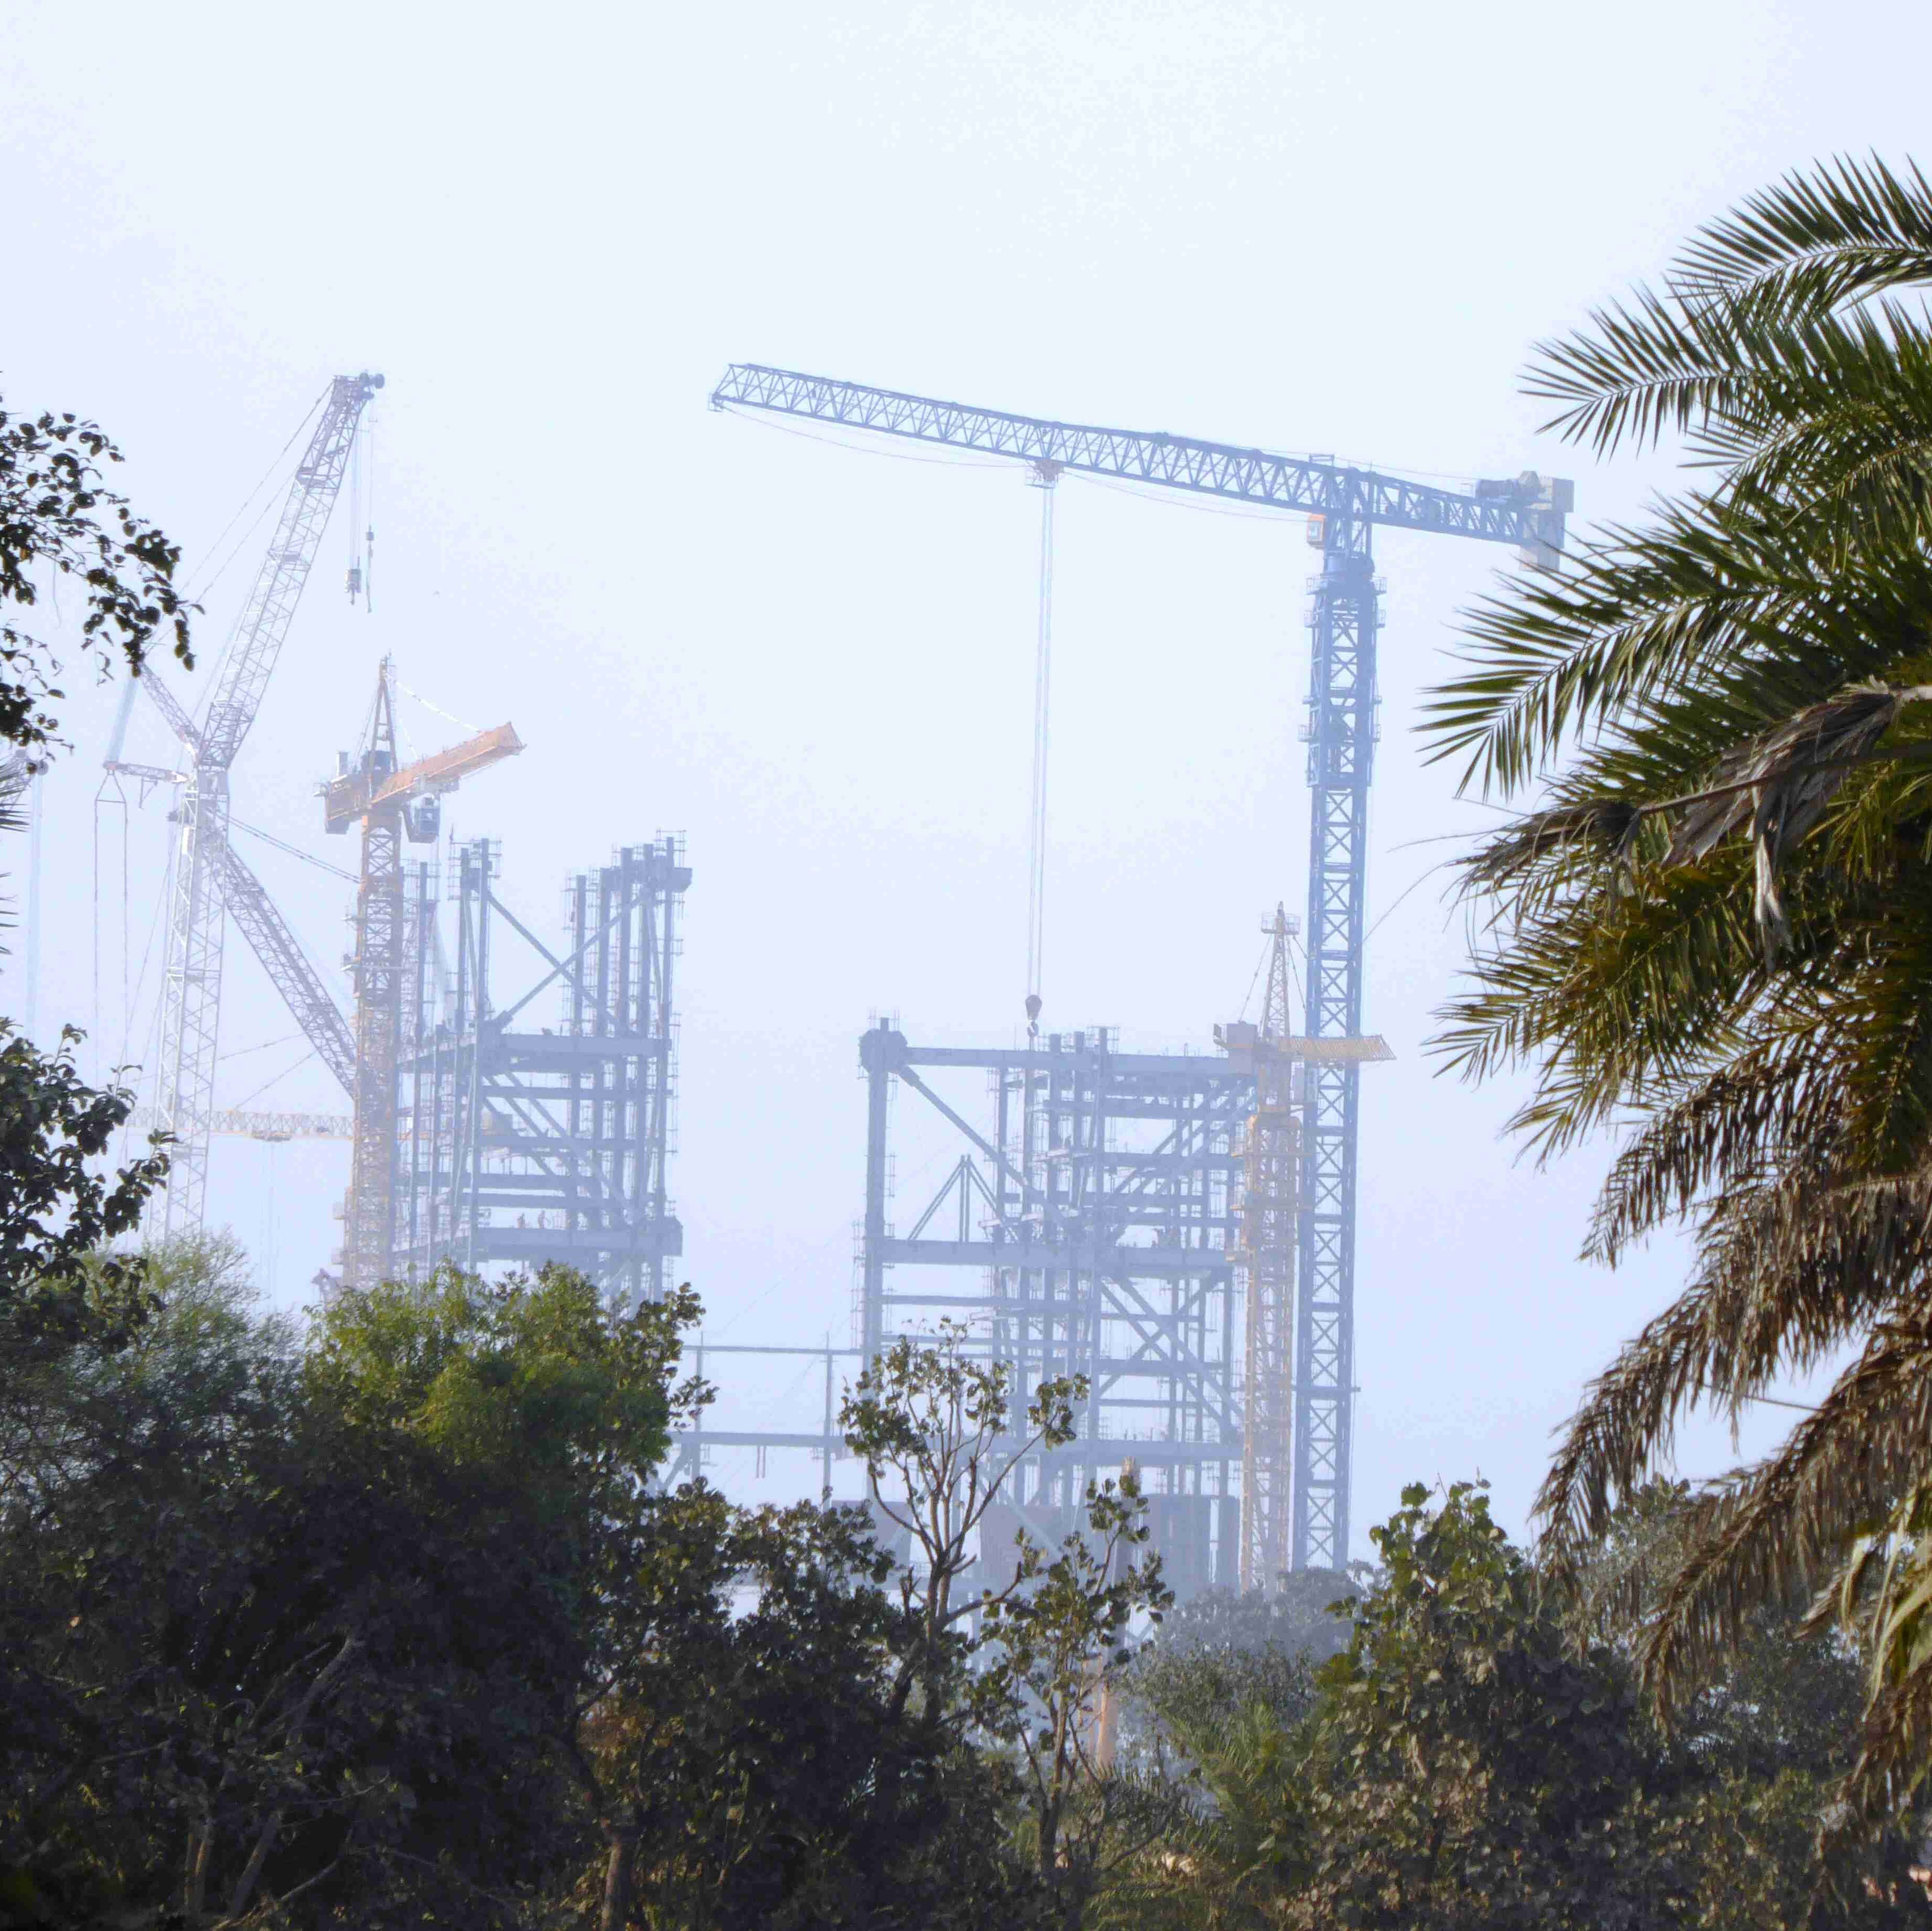 Skeleton of Adani's Godda power station, February 2020. Photo- Geoff Law